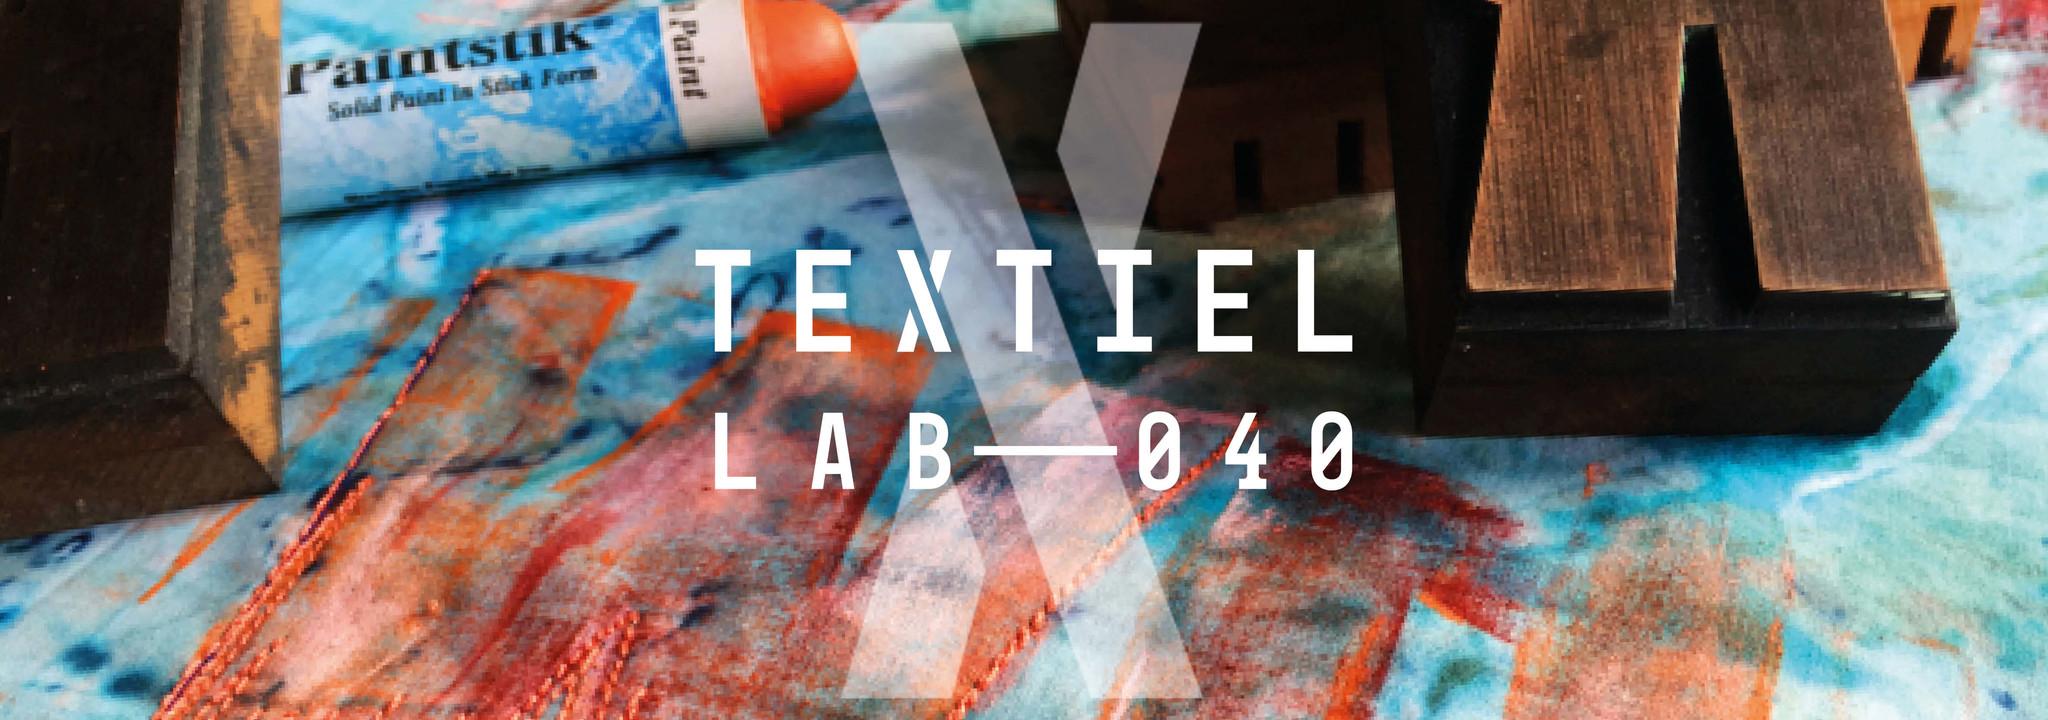 Headline Textiellab-040